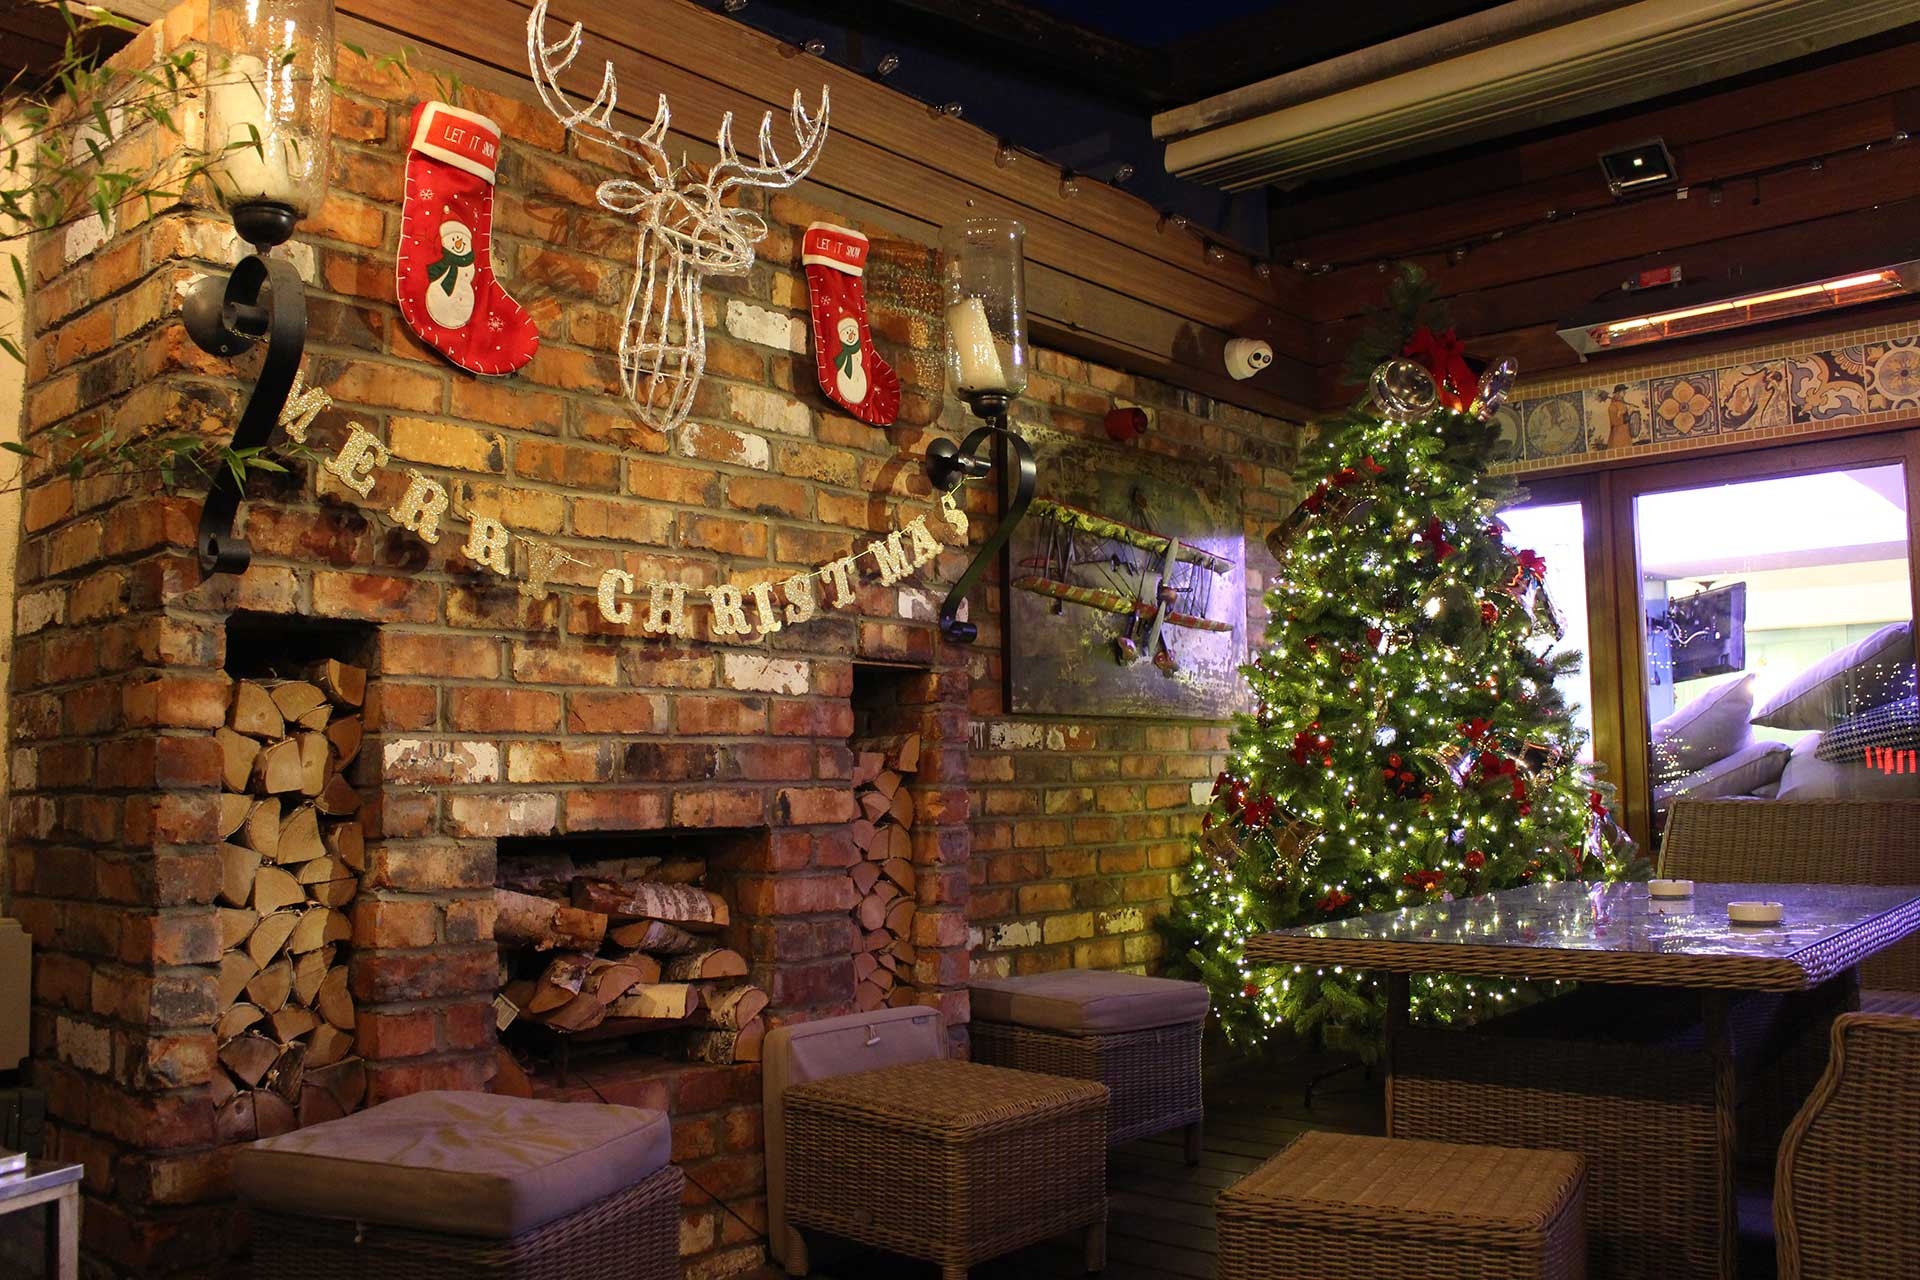 kealys-best-christmas-parties-swords-county-dublin-1